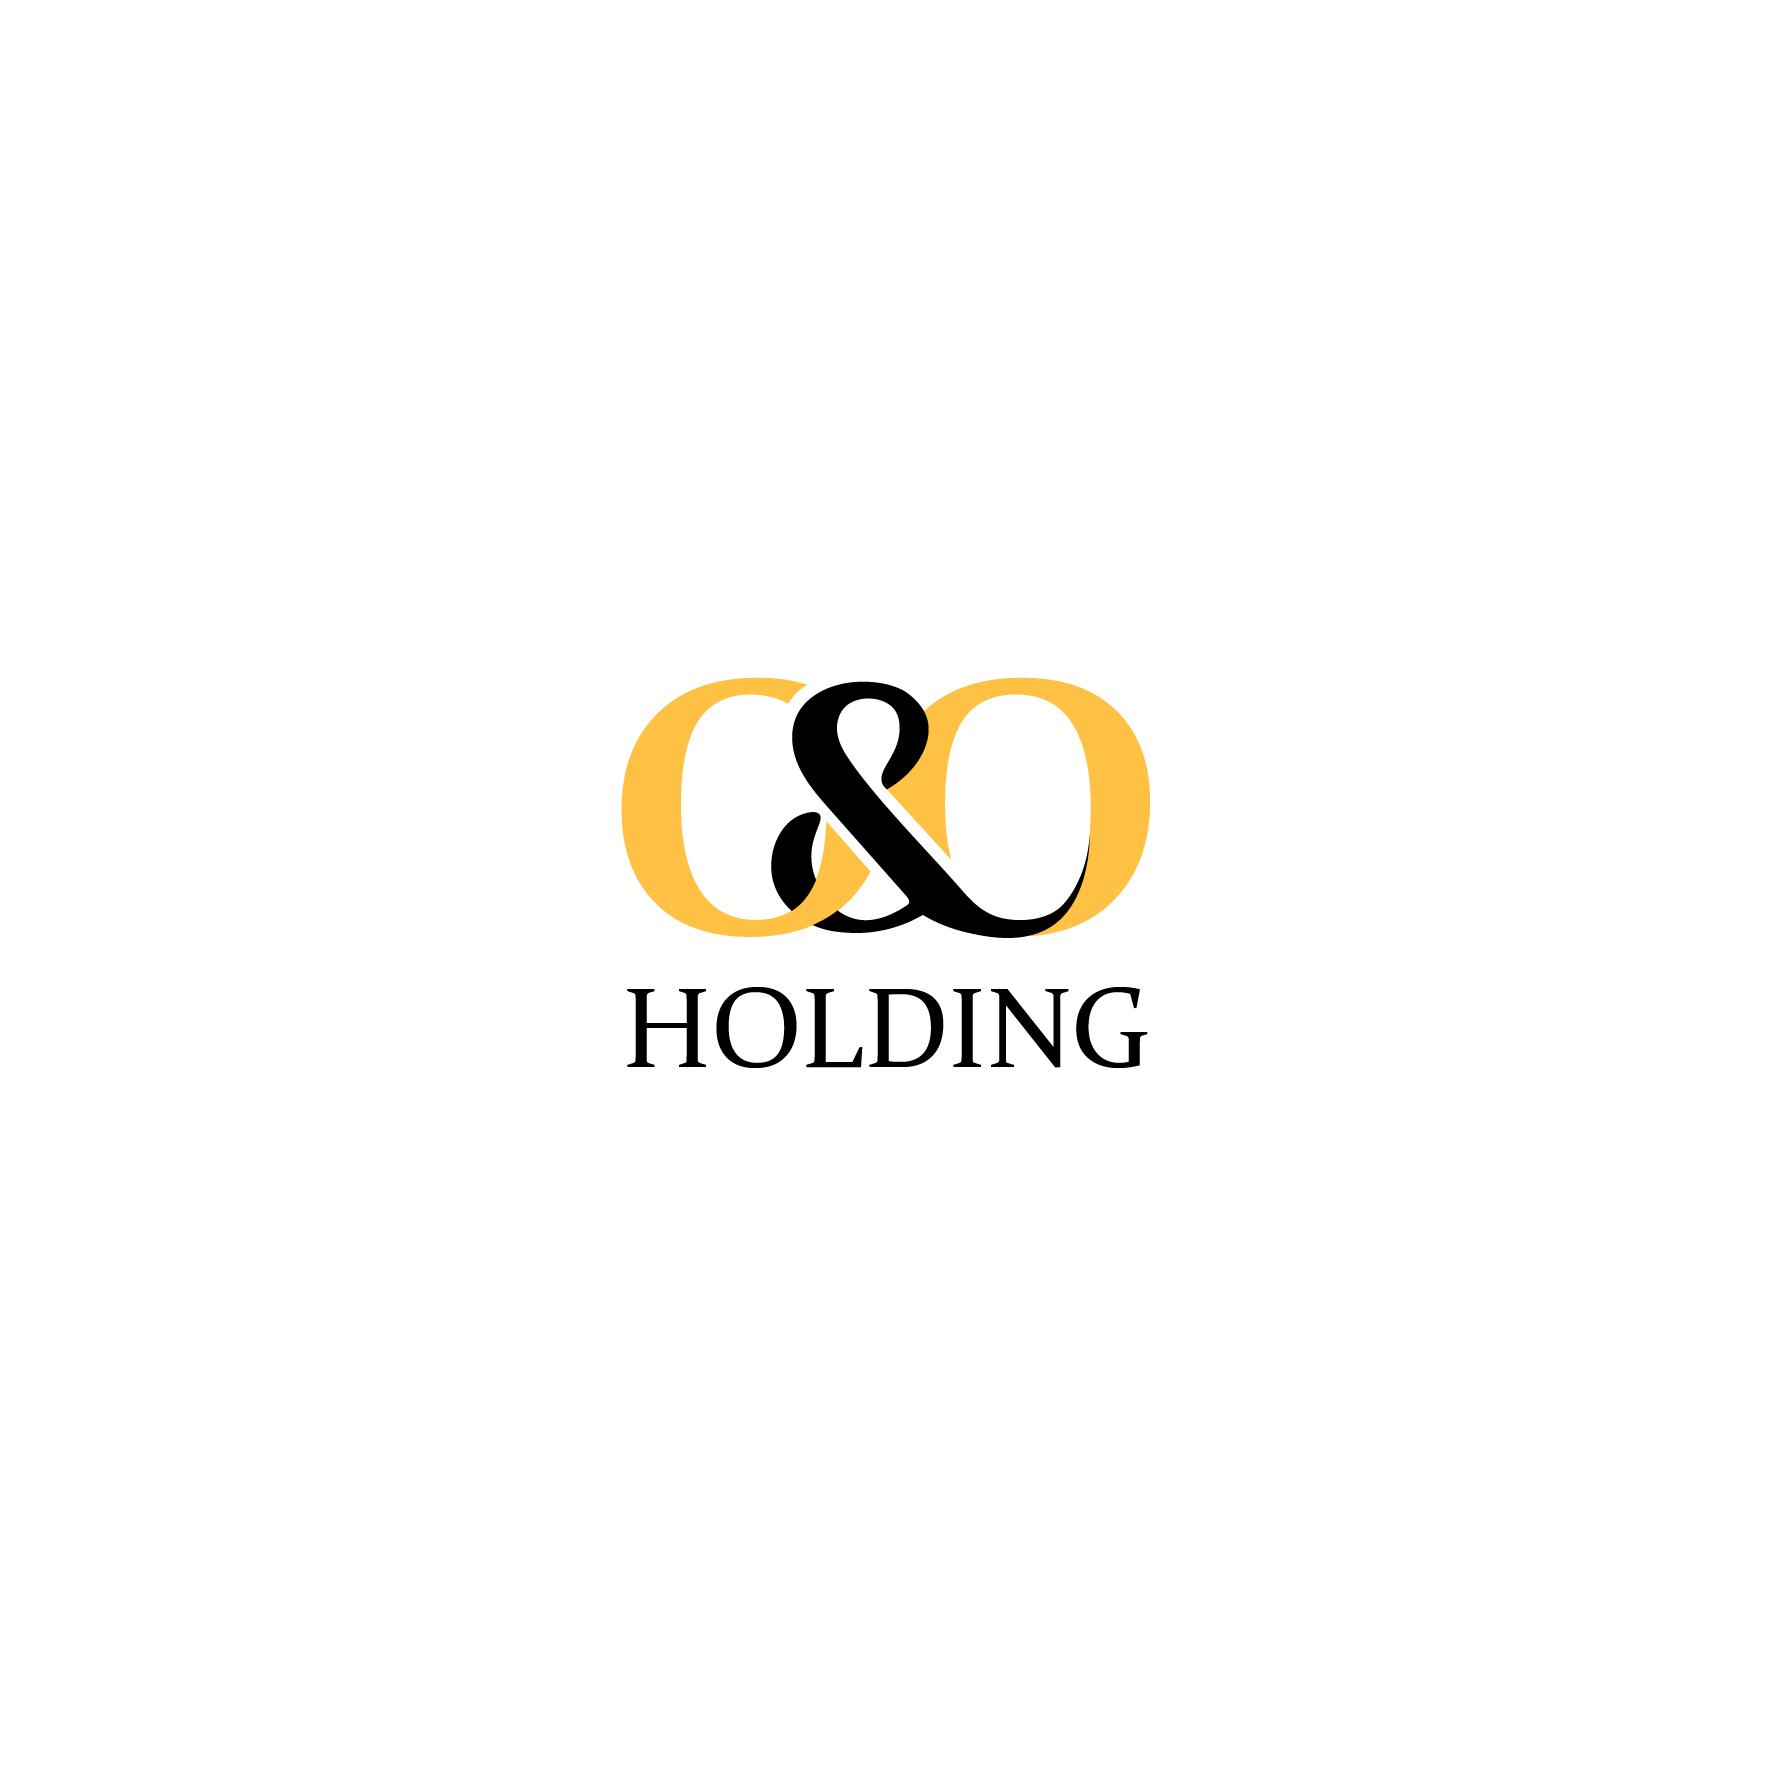 "Разработка Логотипа +  Фирменного знака для компании ""O & O HOLDING"" фото f_2265c7b043e21076.jpg"